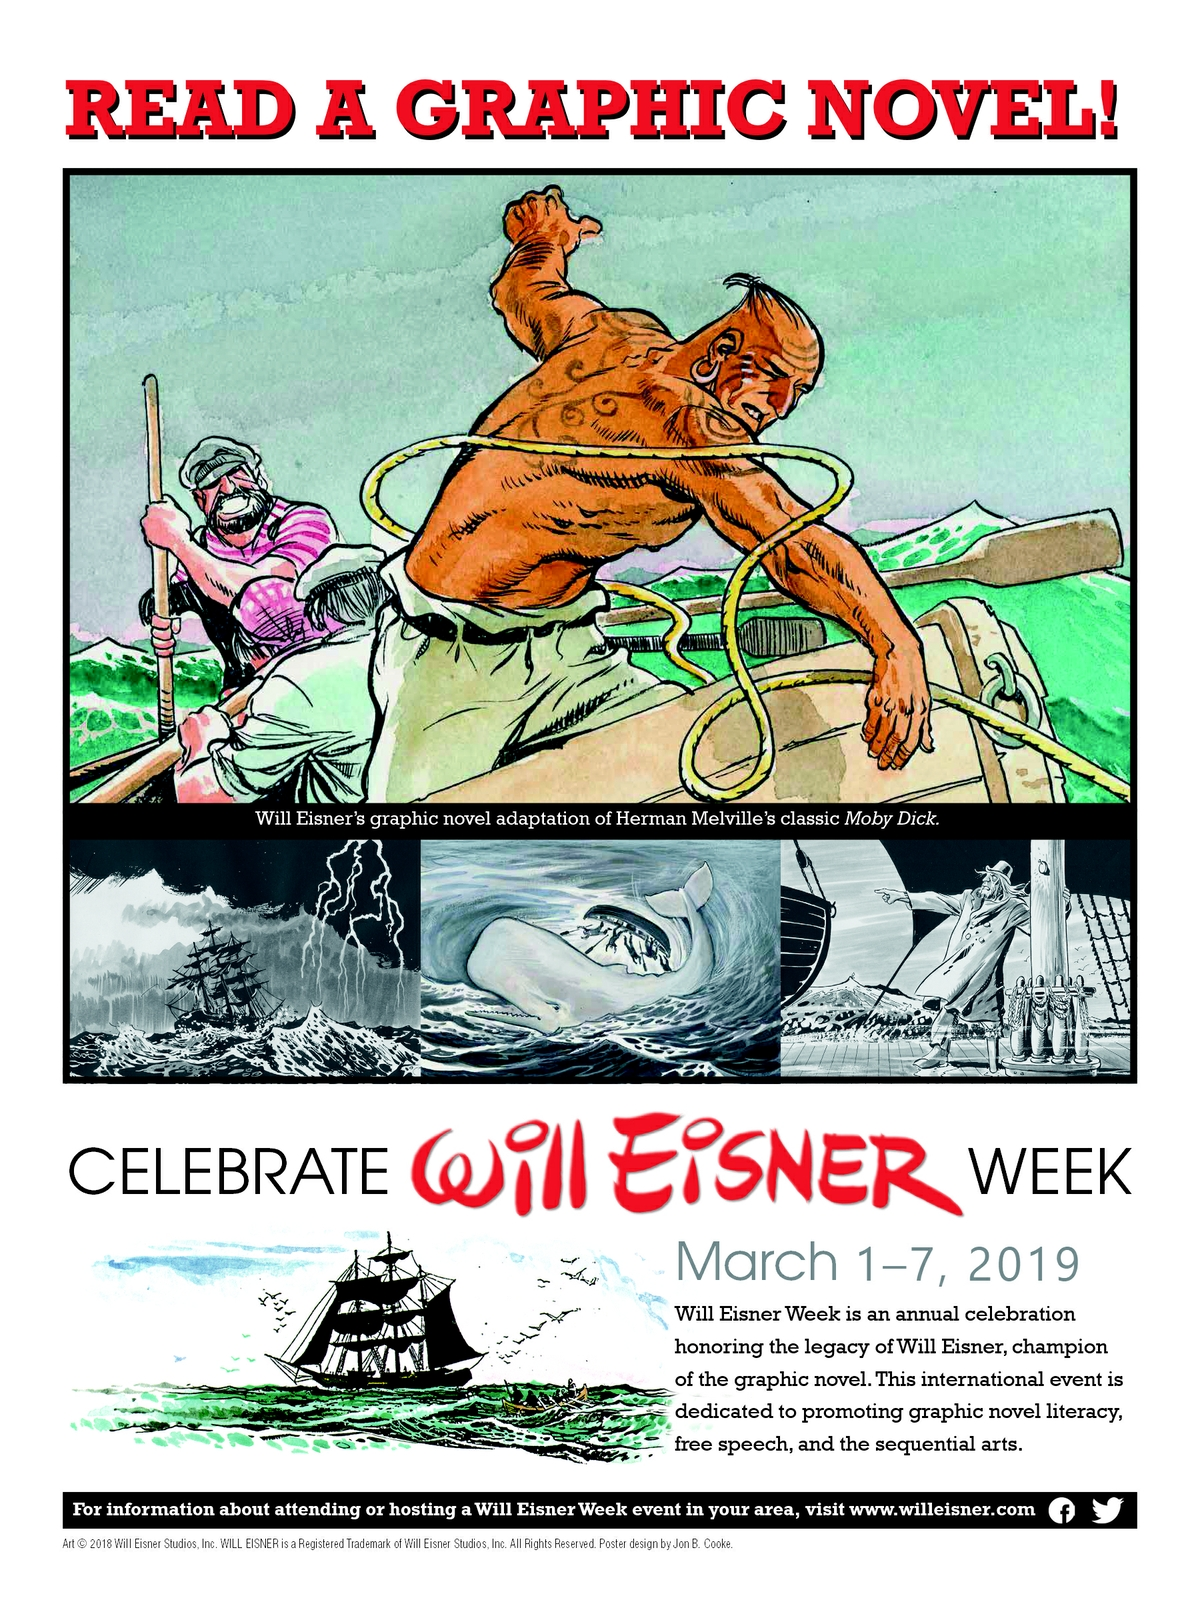 http://www.willeisner.com/the_eisnershpritz/WEFF_WEW2019_Poster_150.jpg